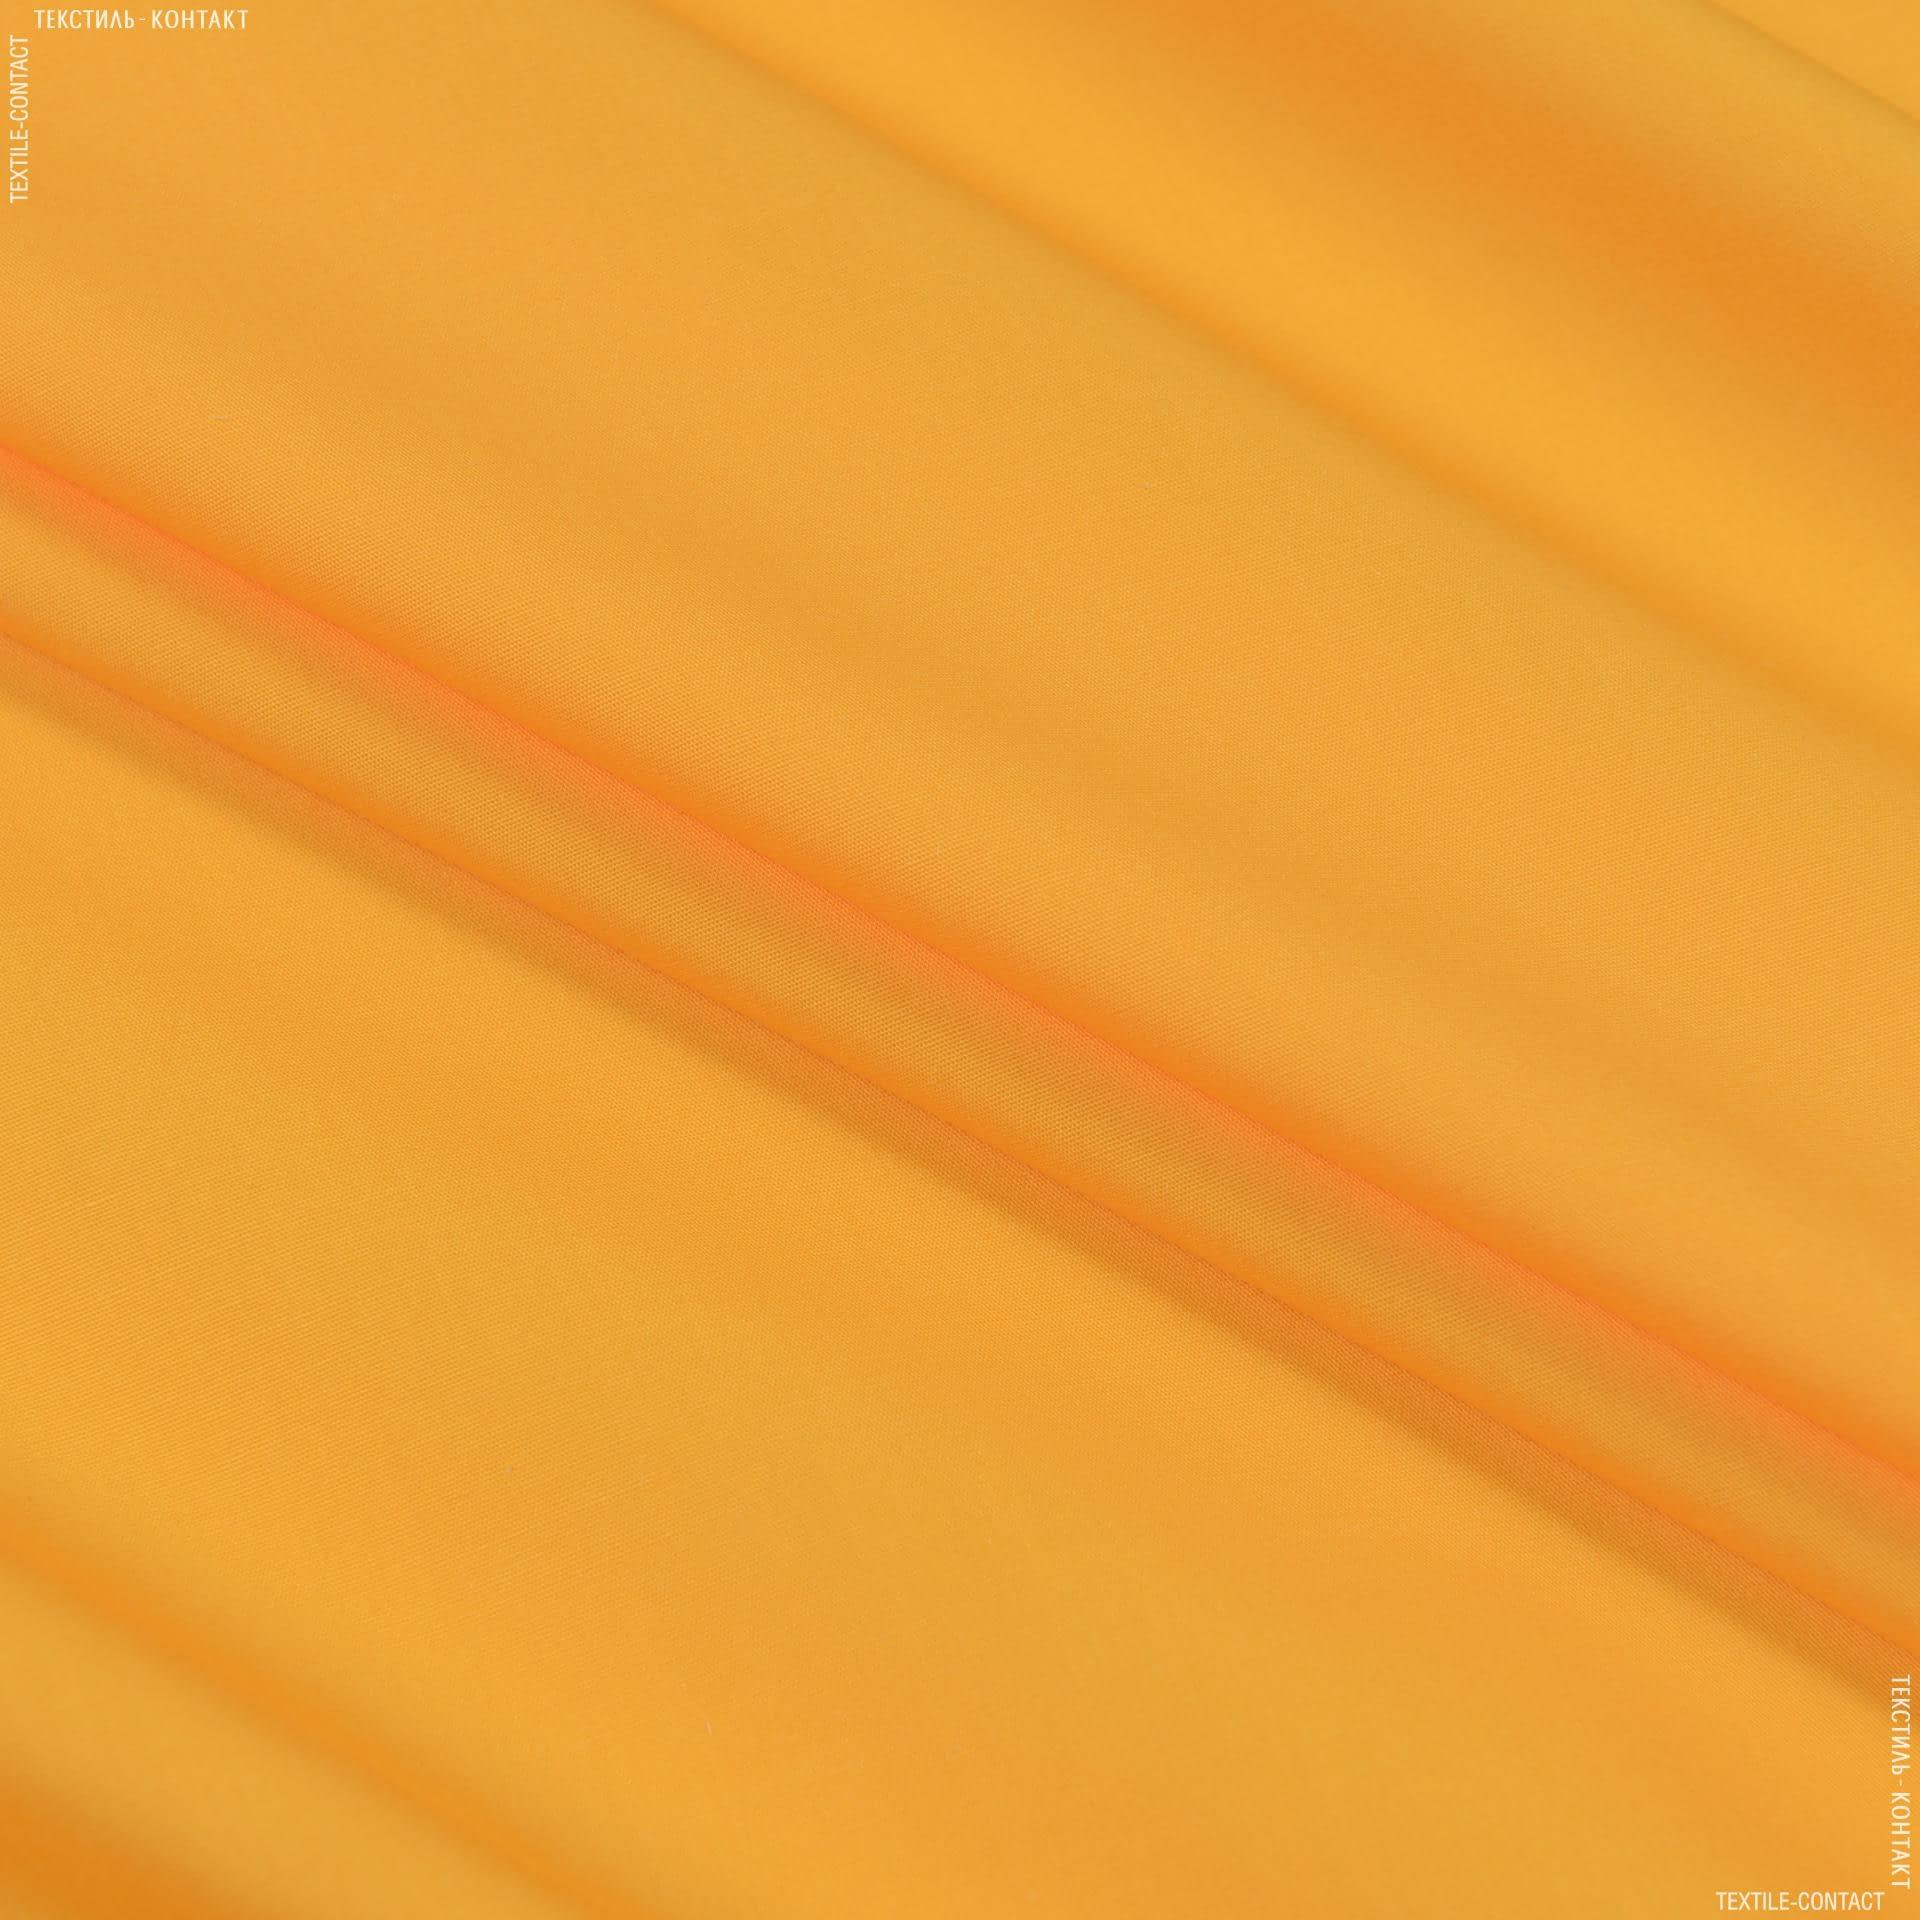 Тканини для суконь - Сорочкова яскраво-жовтий